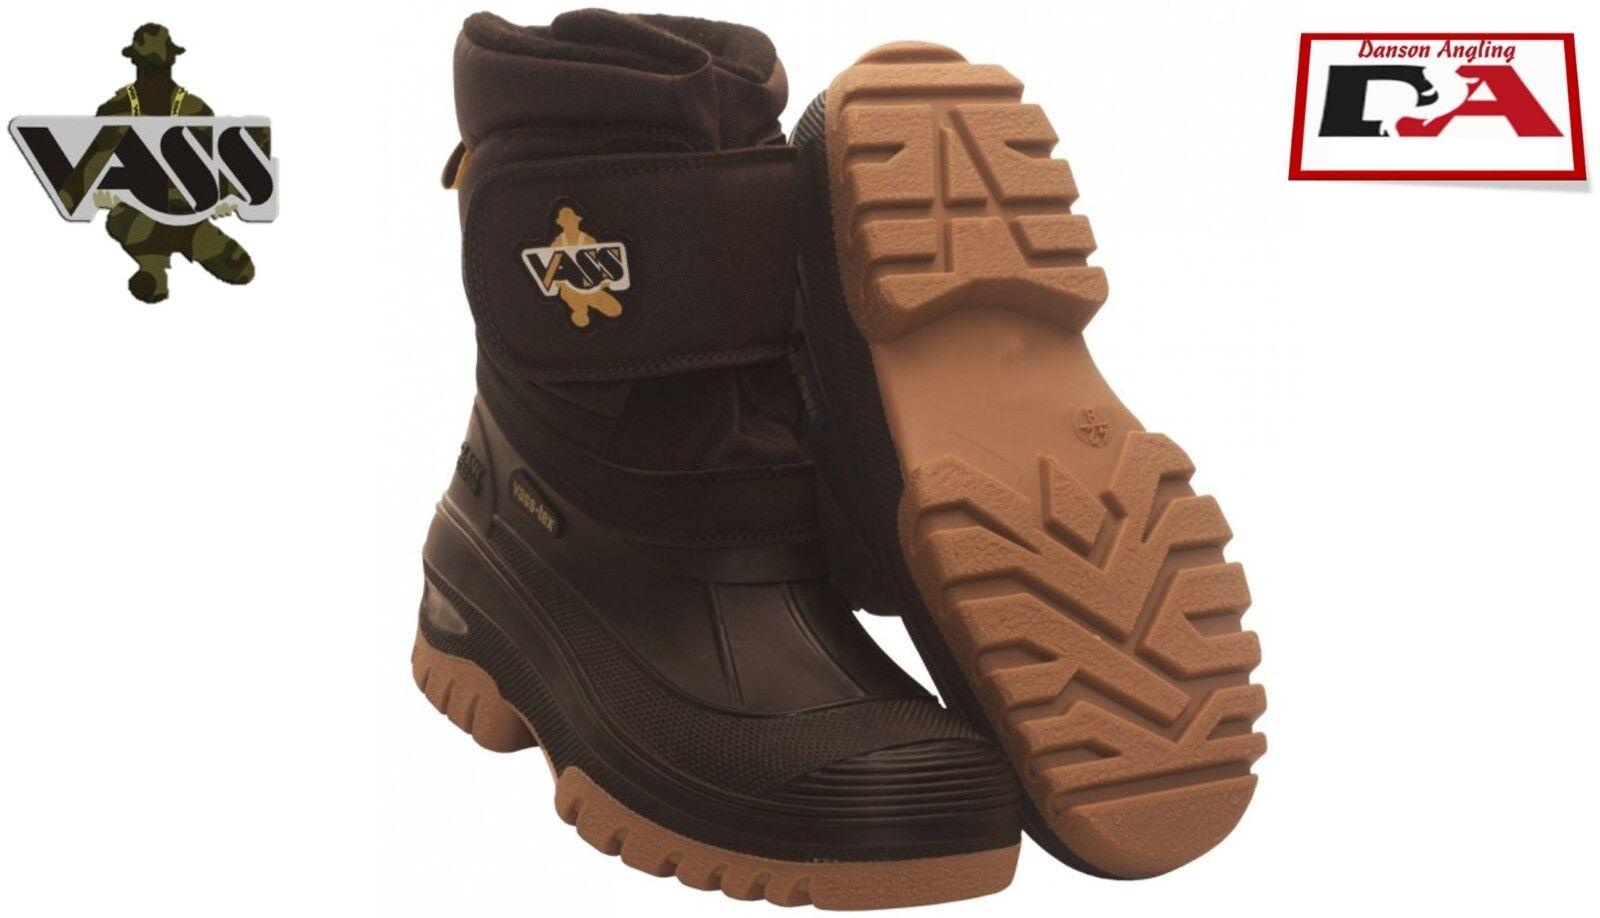 Vass Fleeced Lined Velcro Boots Size 8 New